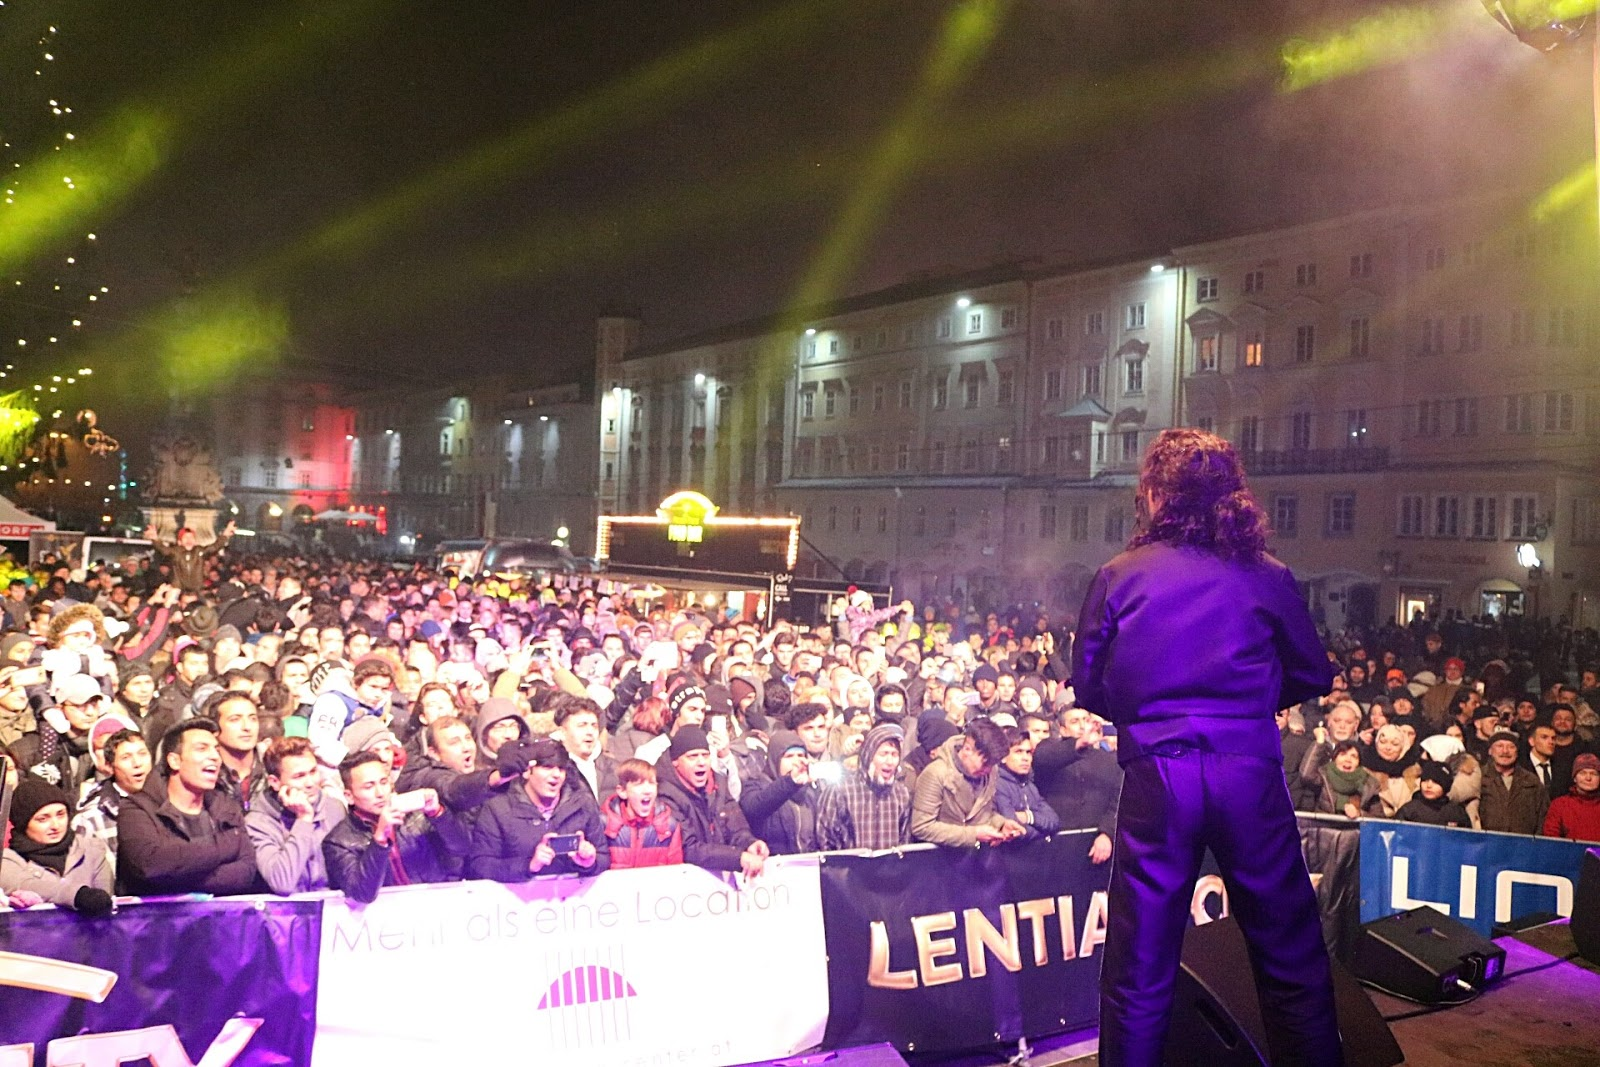 Delfim Miranda - Michael Jackson Tribute - Bad - Live in Autria - New Years Eve Show